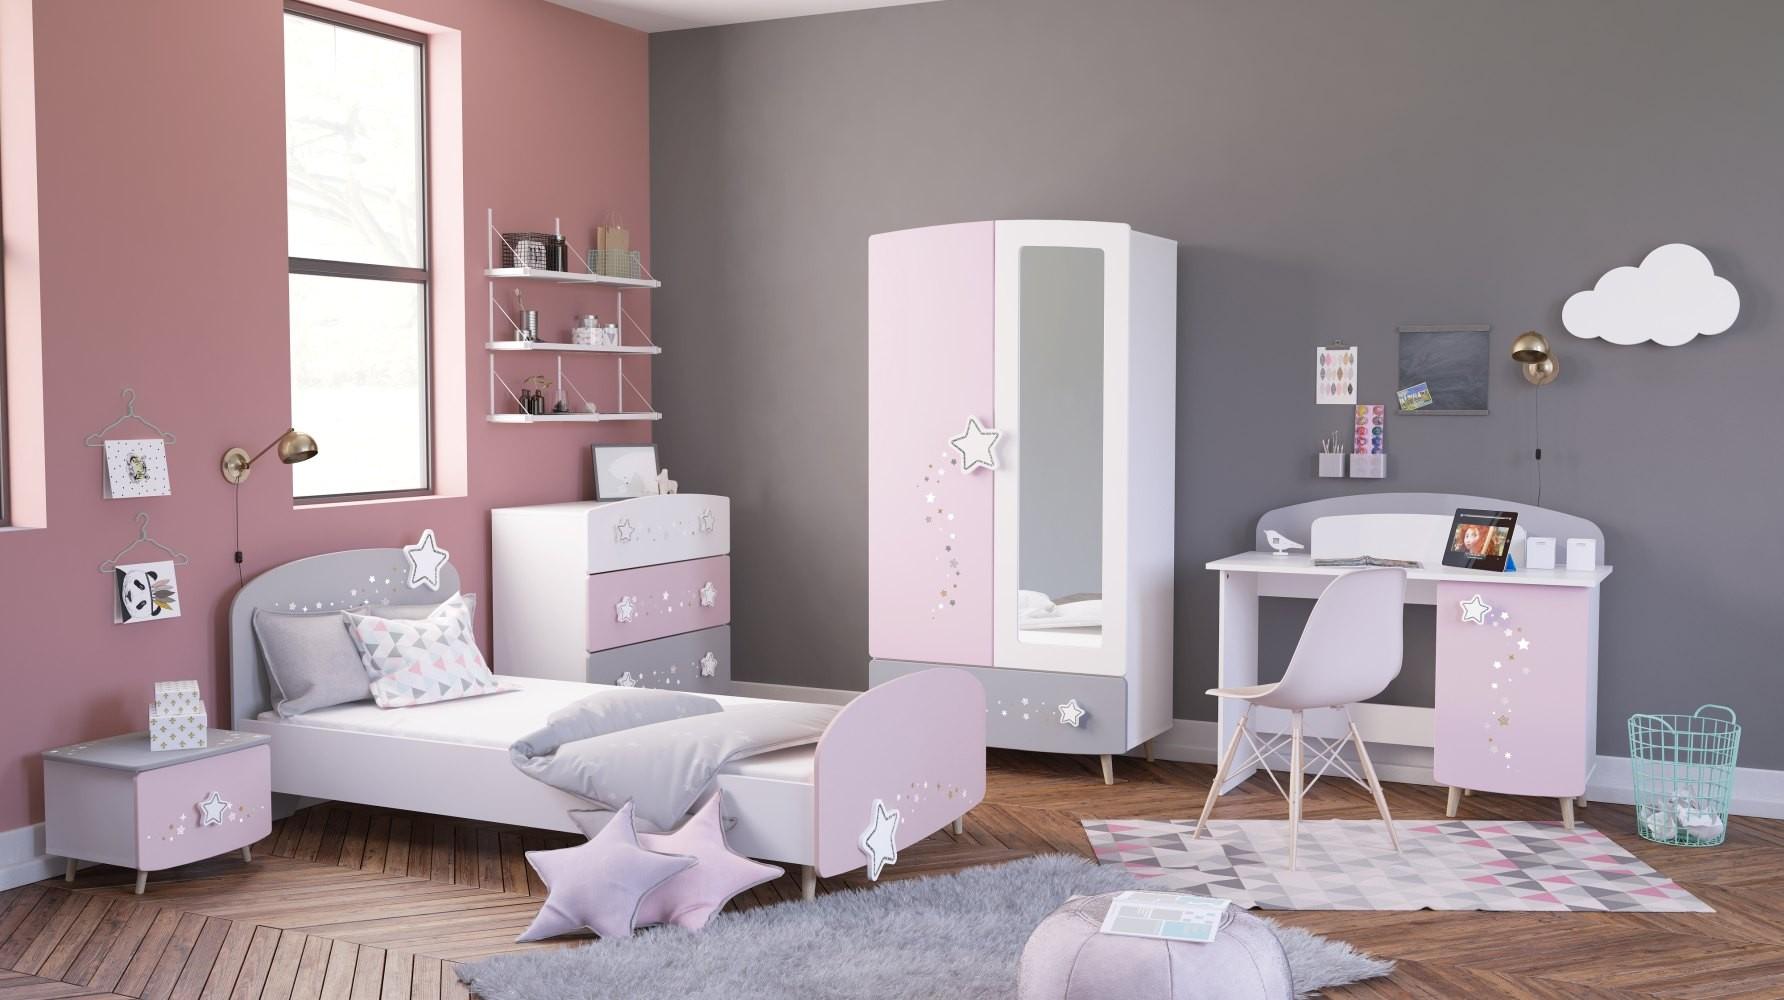 Full Size of Wandfarbe Rosa Küche Wohnzimmer Wandfarbe Rosa